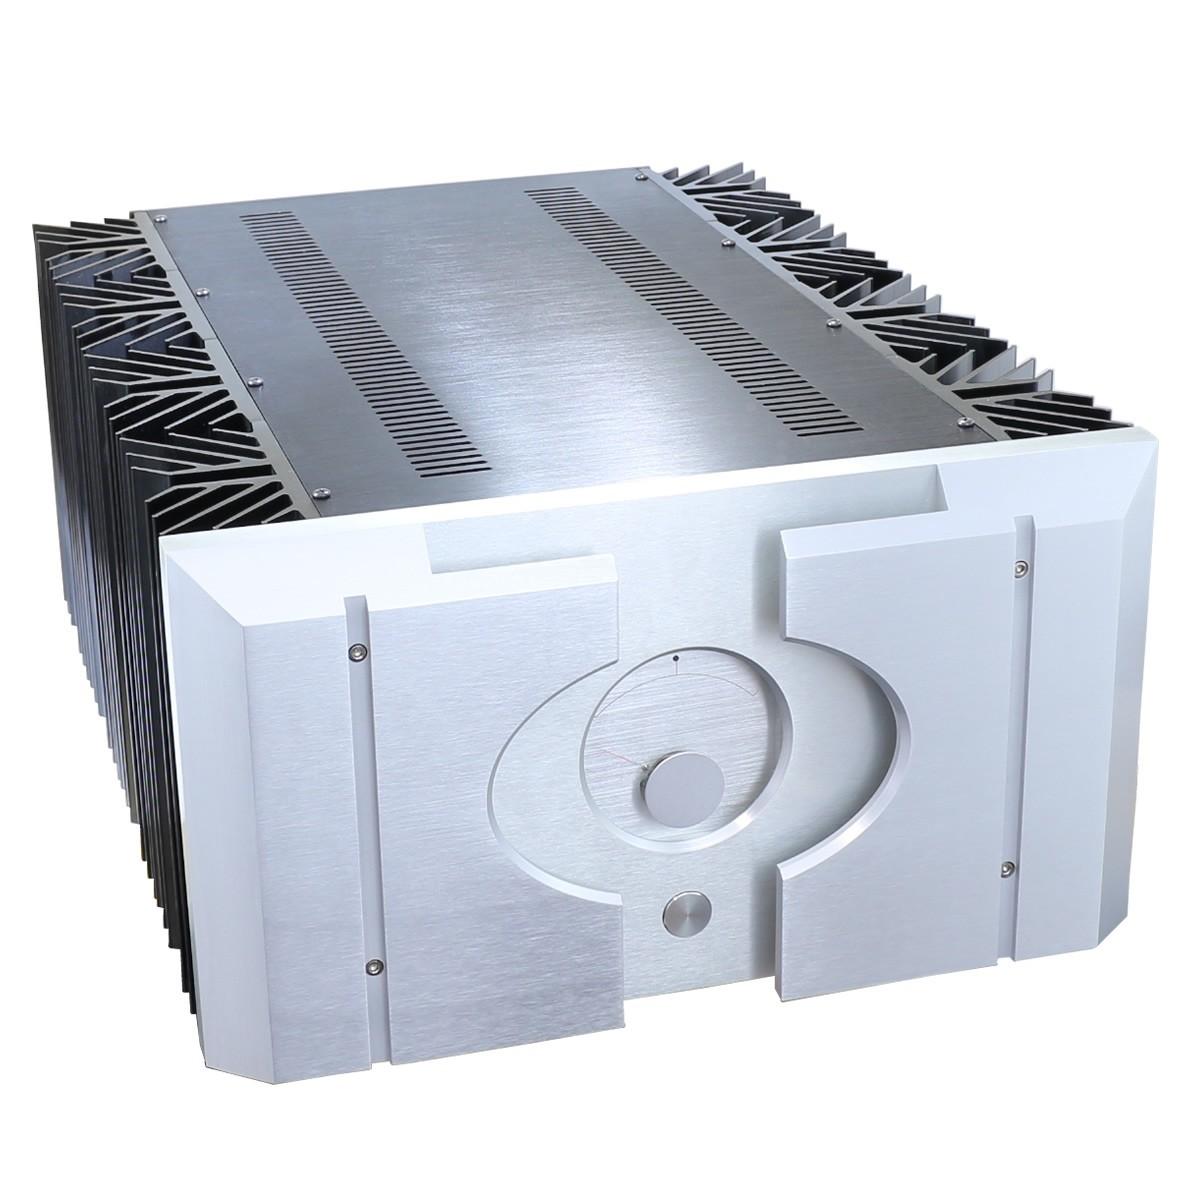 Boitier DIY 100% Aluminium ventilé avec Vu-mètre & dissipateurs 620x480x260mm